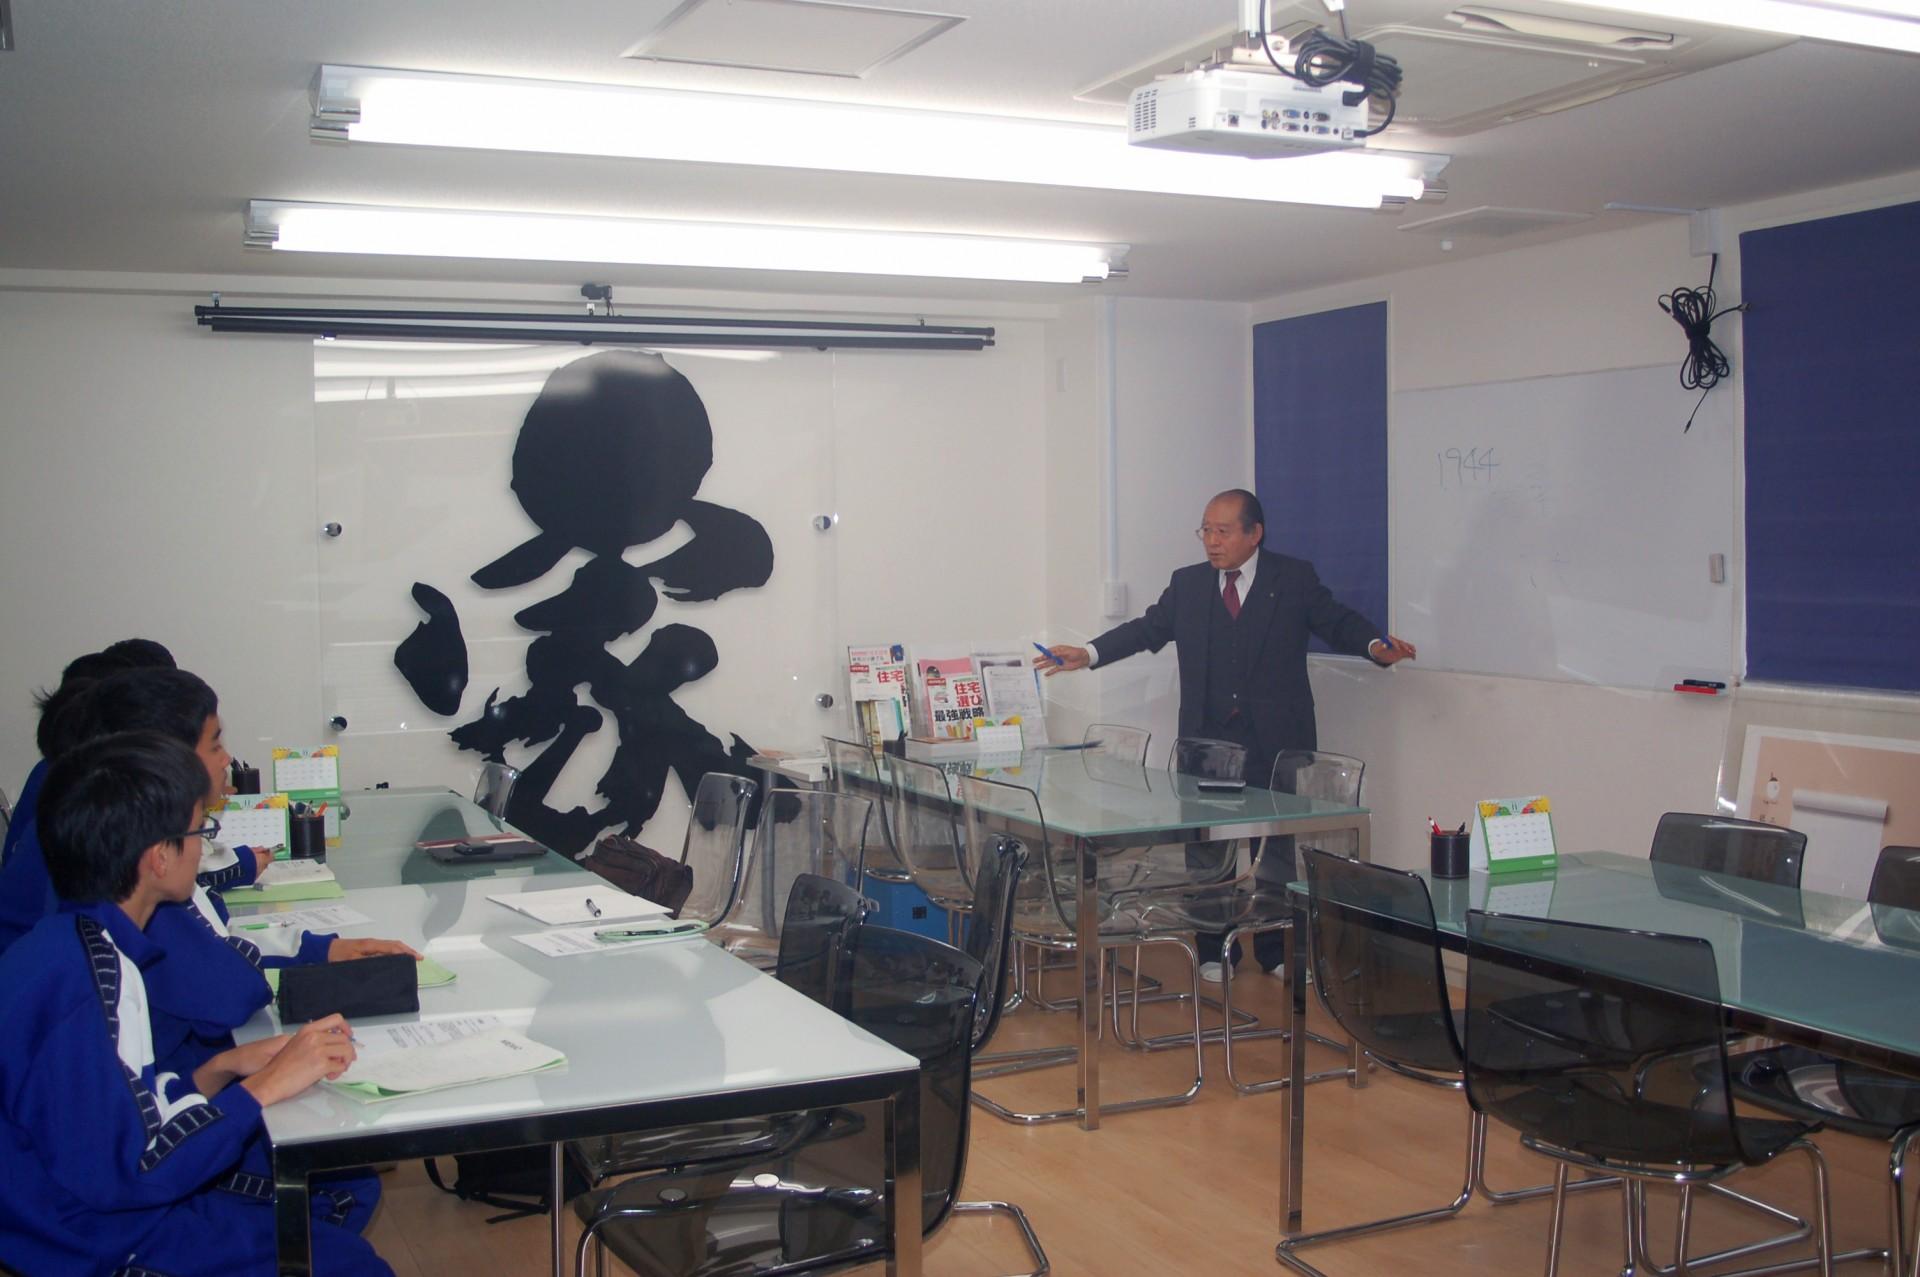 DSC_0059 中学生職場体験学習レポートⅠ